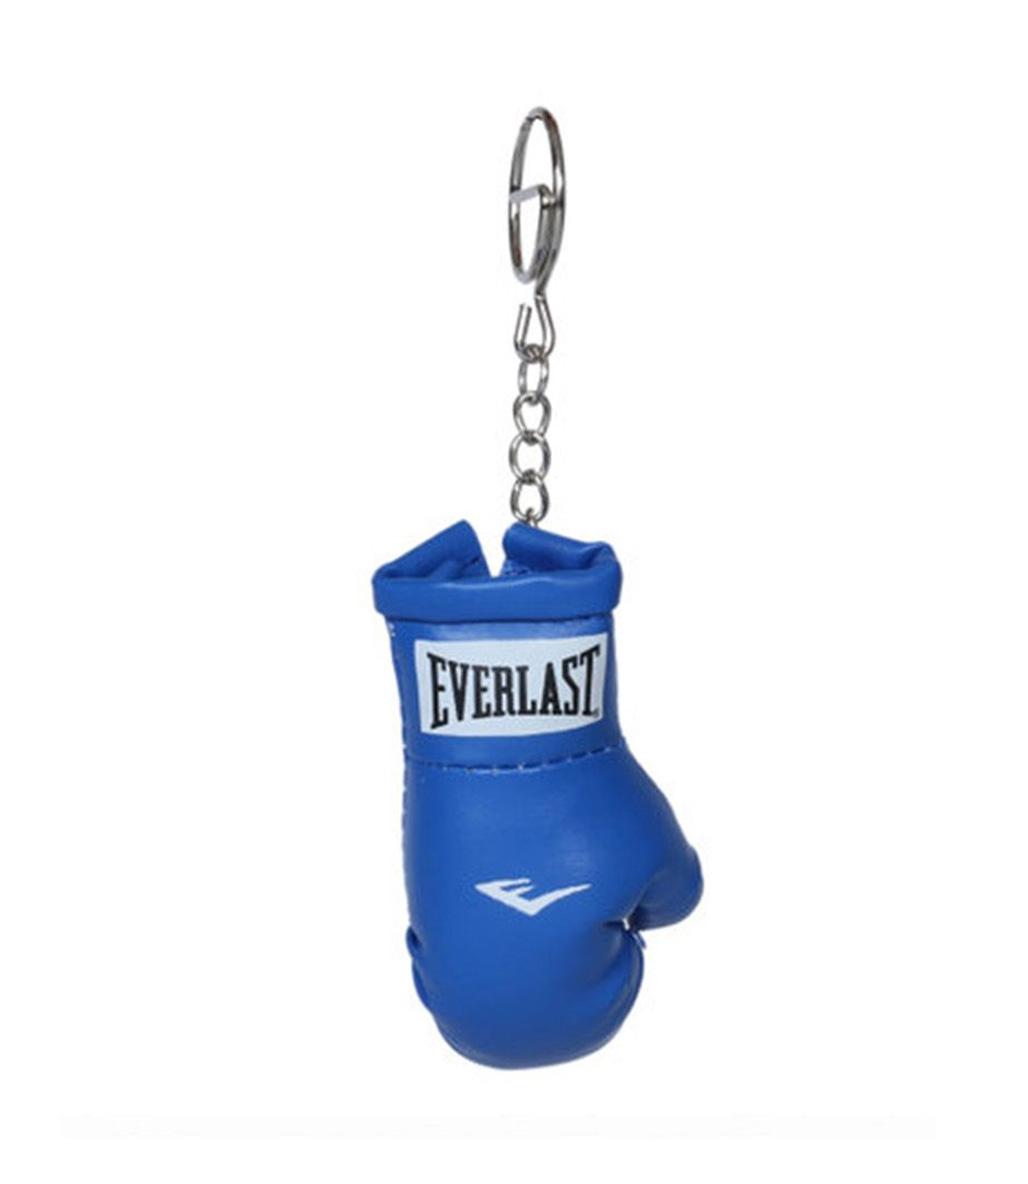 Everlast Minyatür Boks Eldiveni Anahtarlık Mavi